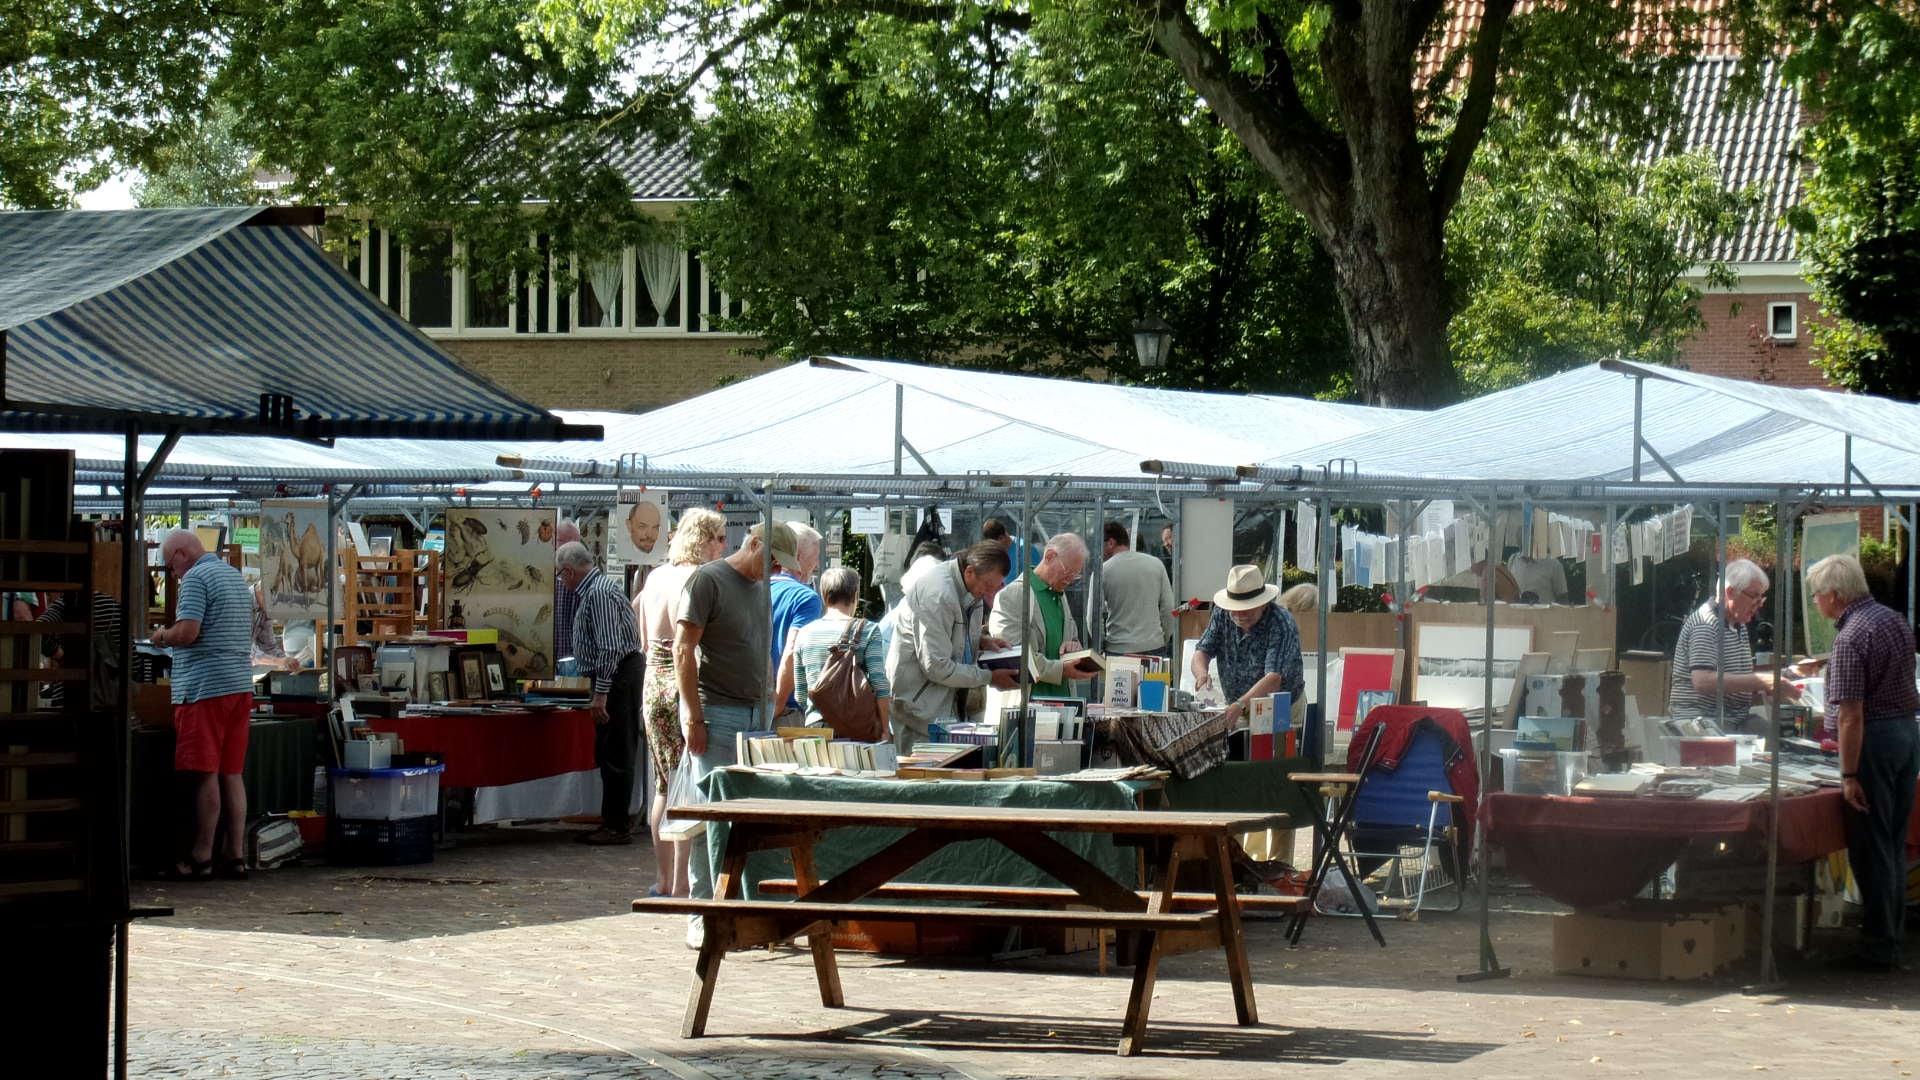 book market at Bredevoort